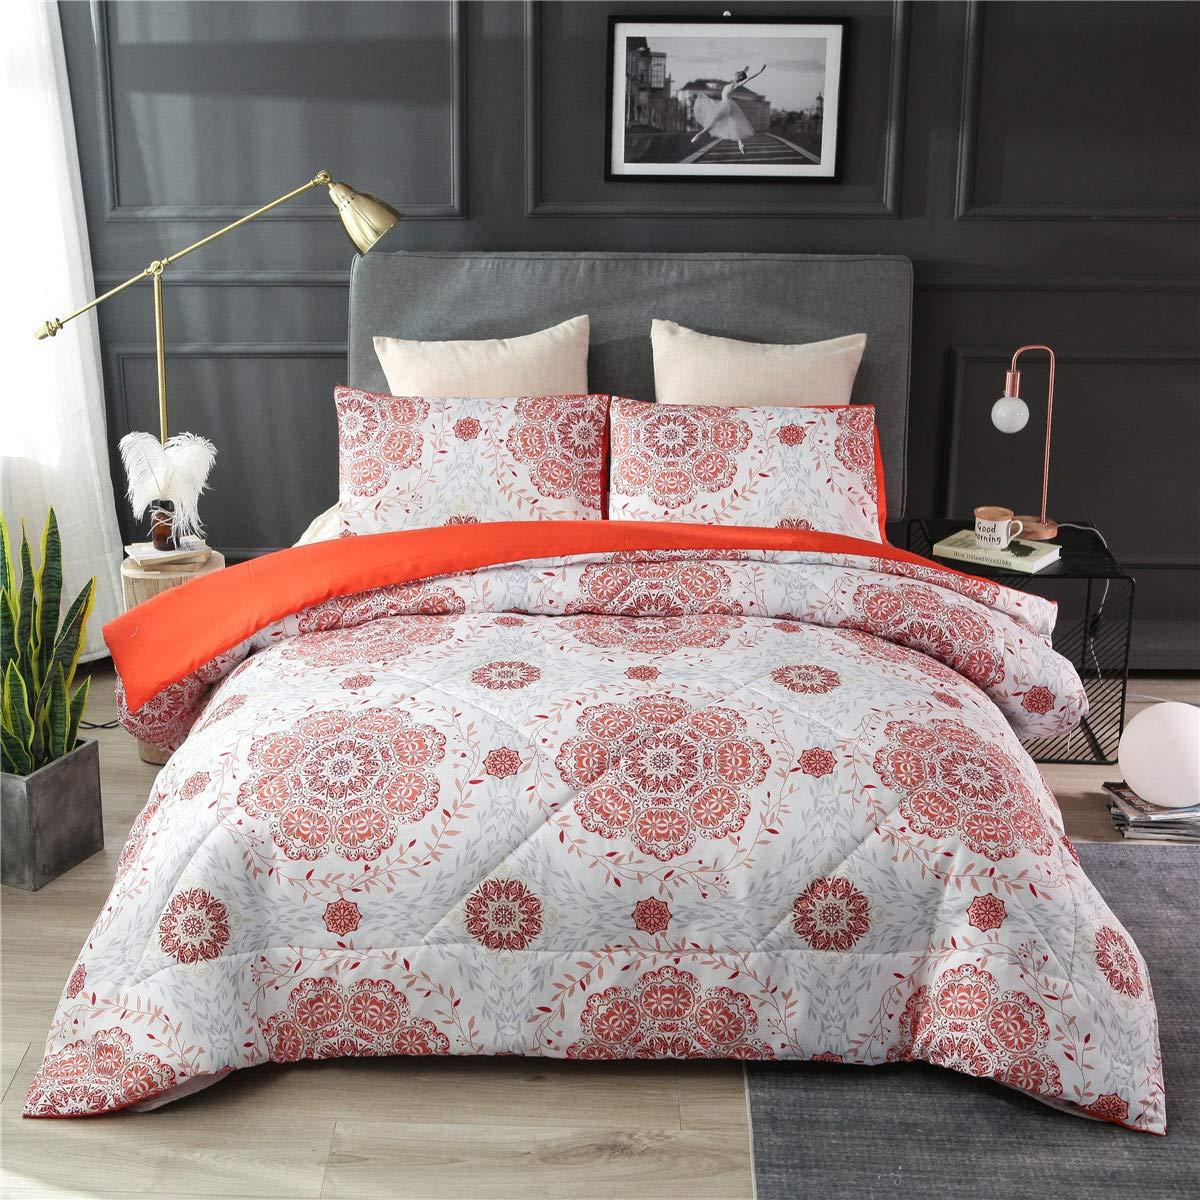 NTBED Bohemian Comforter Sets Queen Floral Medallion Printed Lightweight Boho Chic Mandala Bedding Quilt Sets Orange